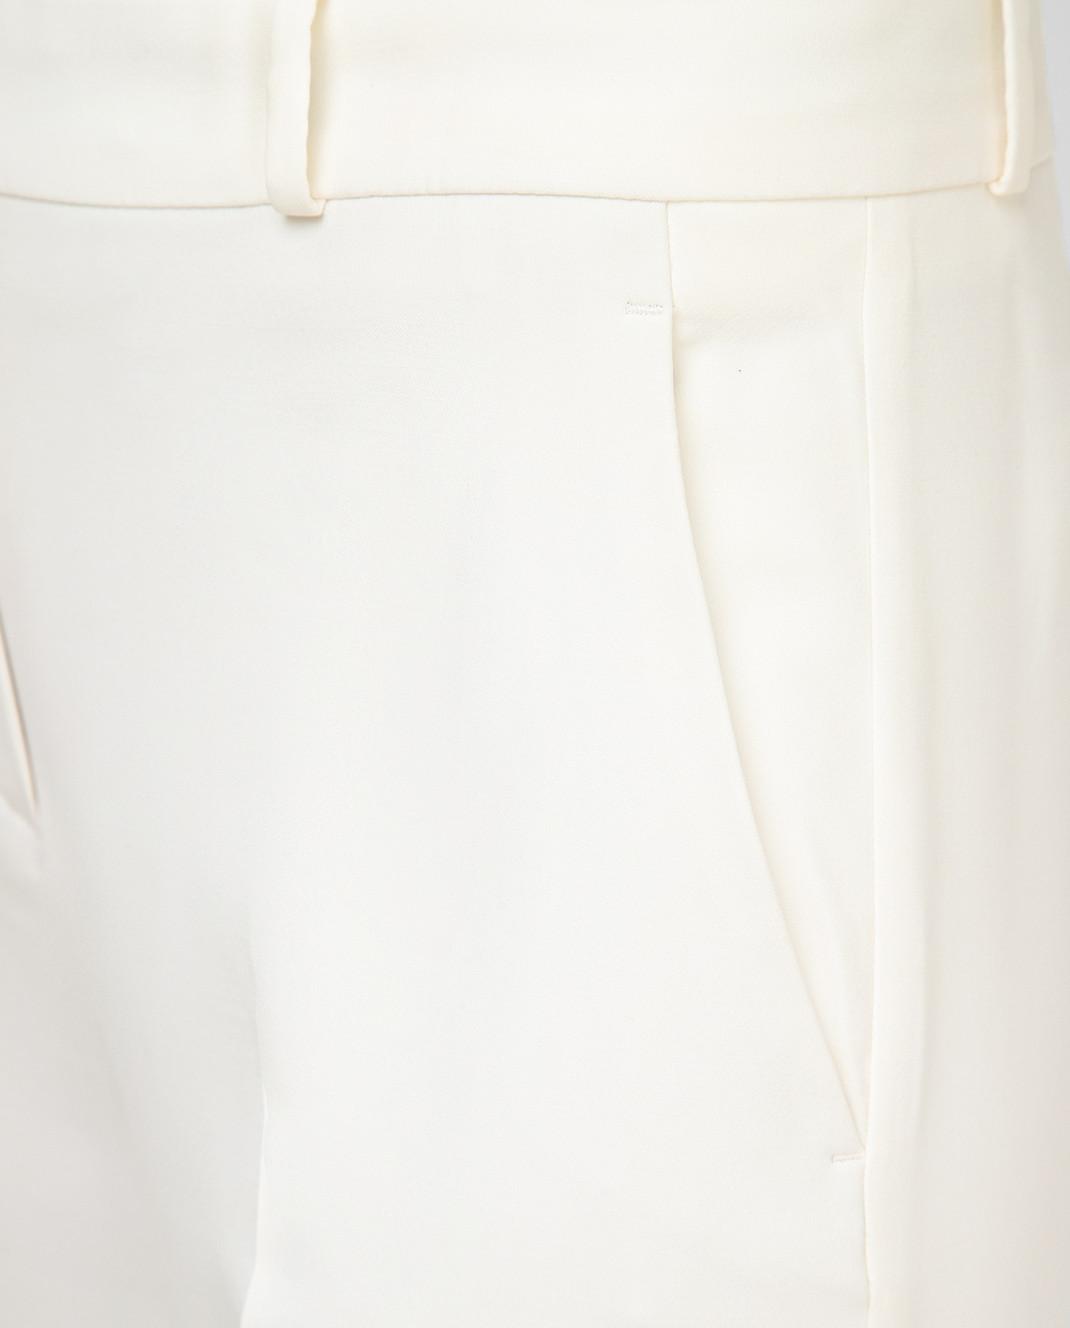 Loro Piana Светло-бежевые брюки из шелка и шерсти F1FAI5226 изображение 5